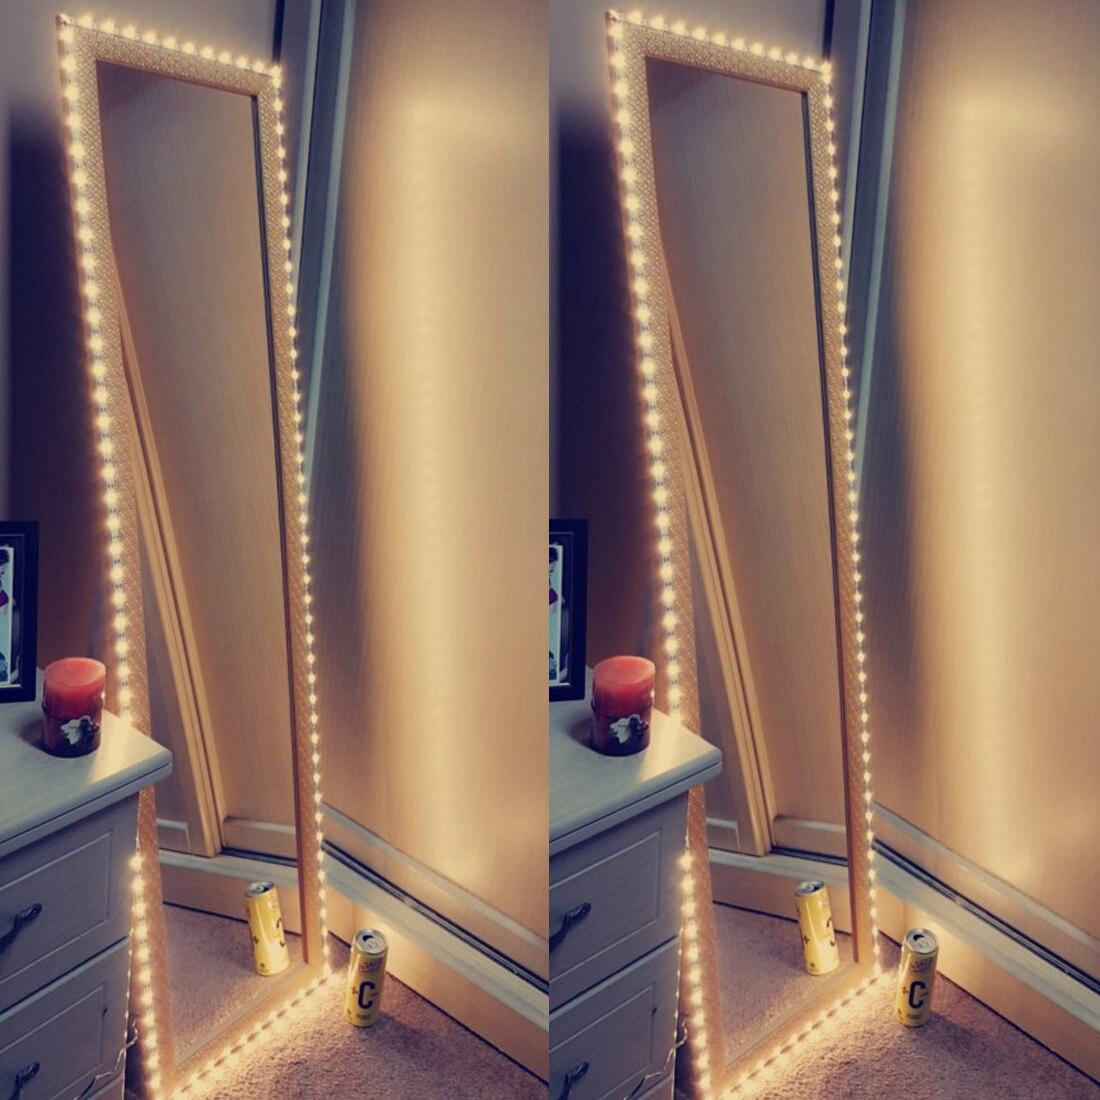 Vanity Makeup Mirror Light 5V USB LED Flexible Tape USB Cable Powered Dressing Mirror Lamp Decor 0.5m -5m Cuttable 5050 30LEDS/M